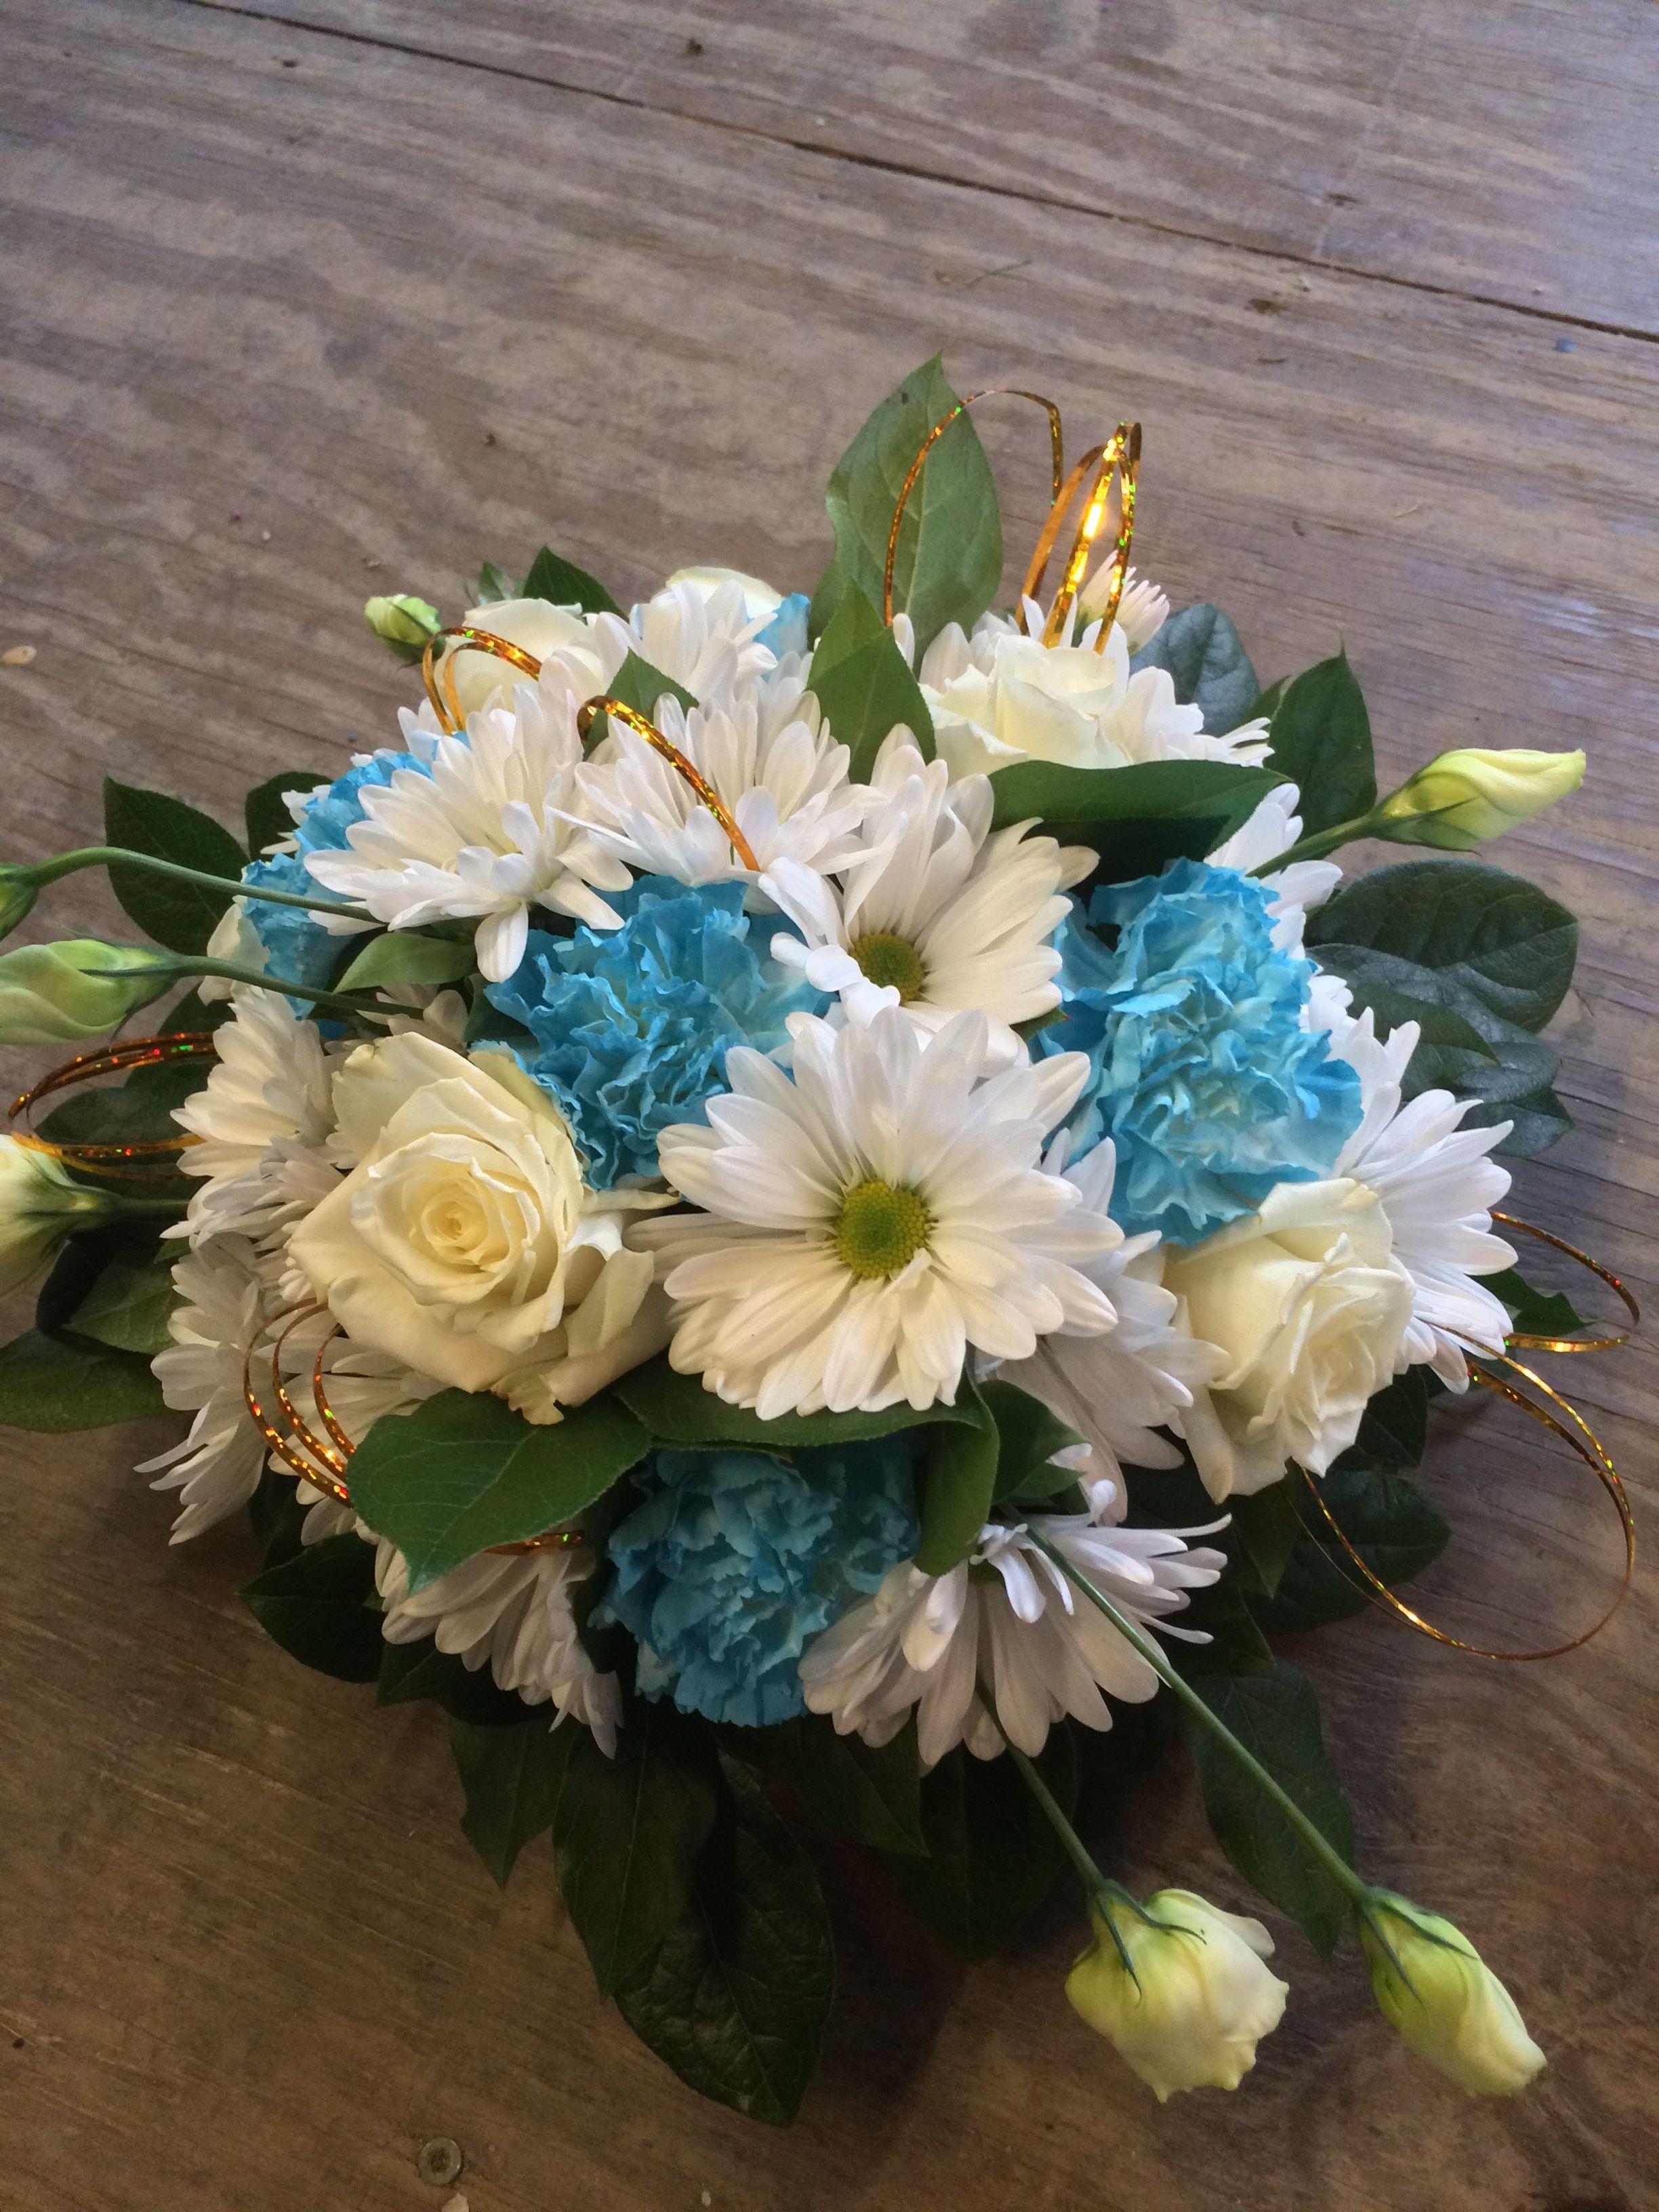 Tiffany blue or ice blue flowers this makes a great wedding bouquet tiffany blue or ice blue flowers this makes a great wedding bouquet or table arrangement brides bouquet izmirmasajfo